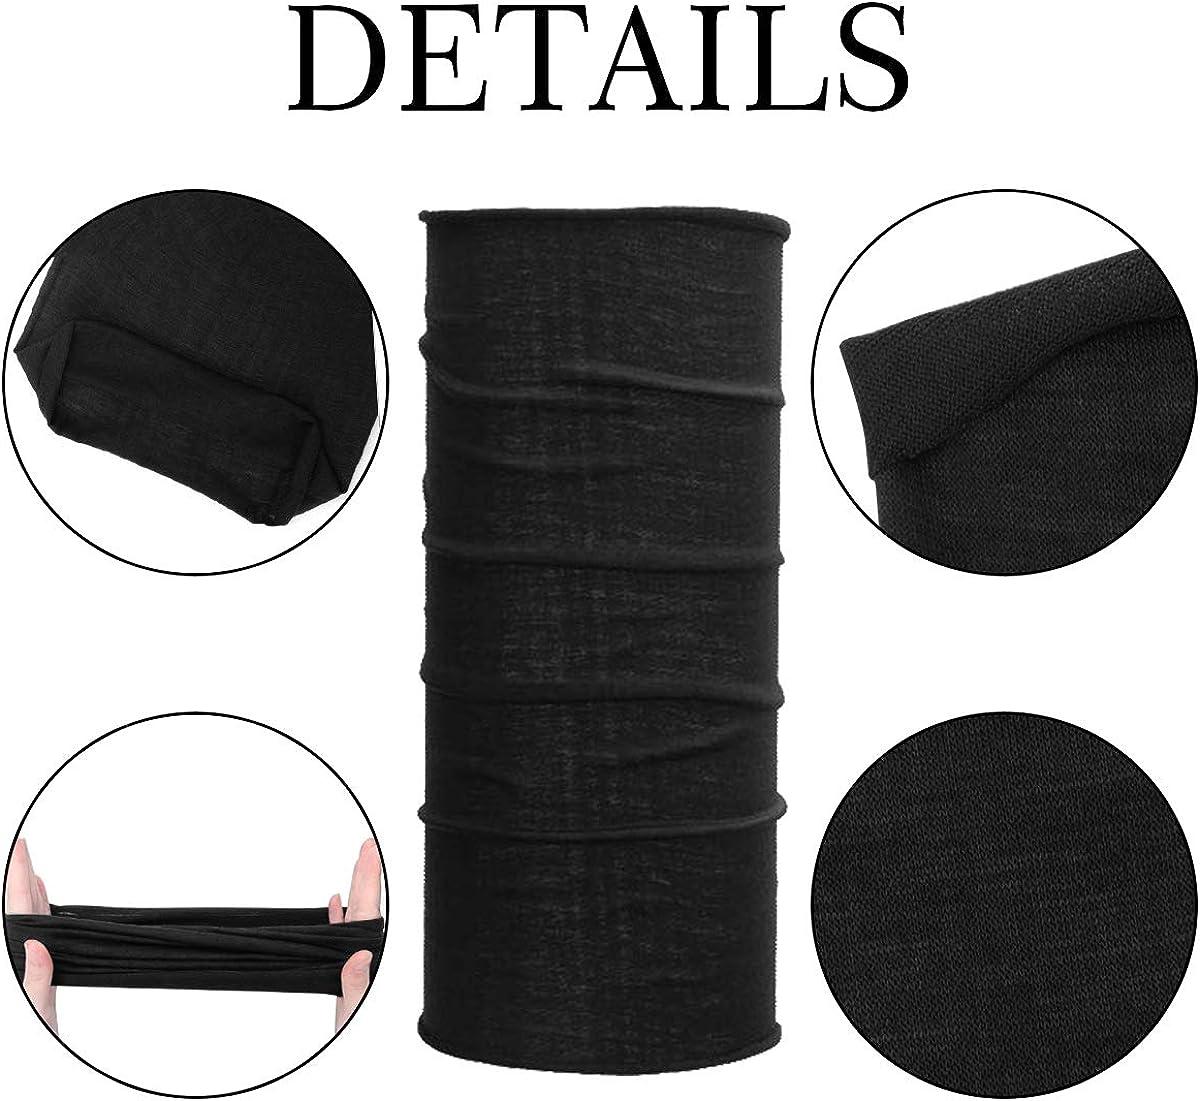 8Pcs Neck Gaiter Bandana for Men Women Dustproof Headwear Neck Gaiter Scarf Seamless Bandanas for Yoga Fishing Sports